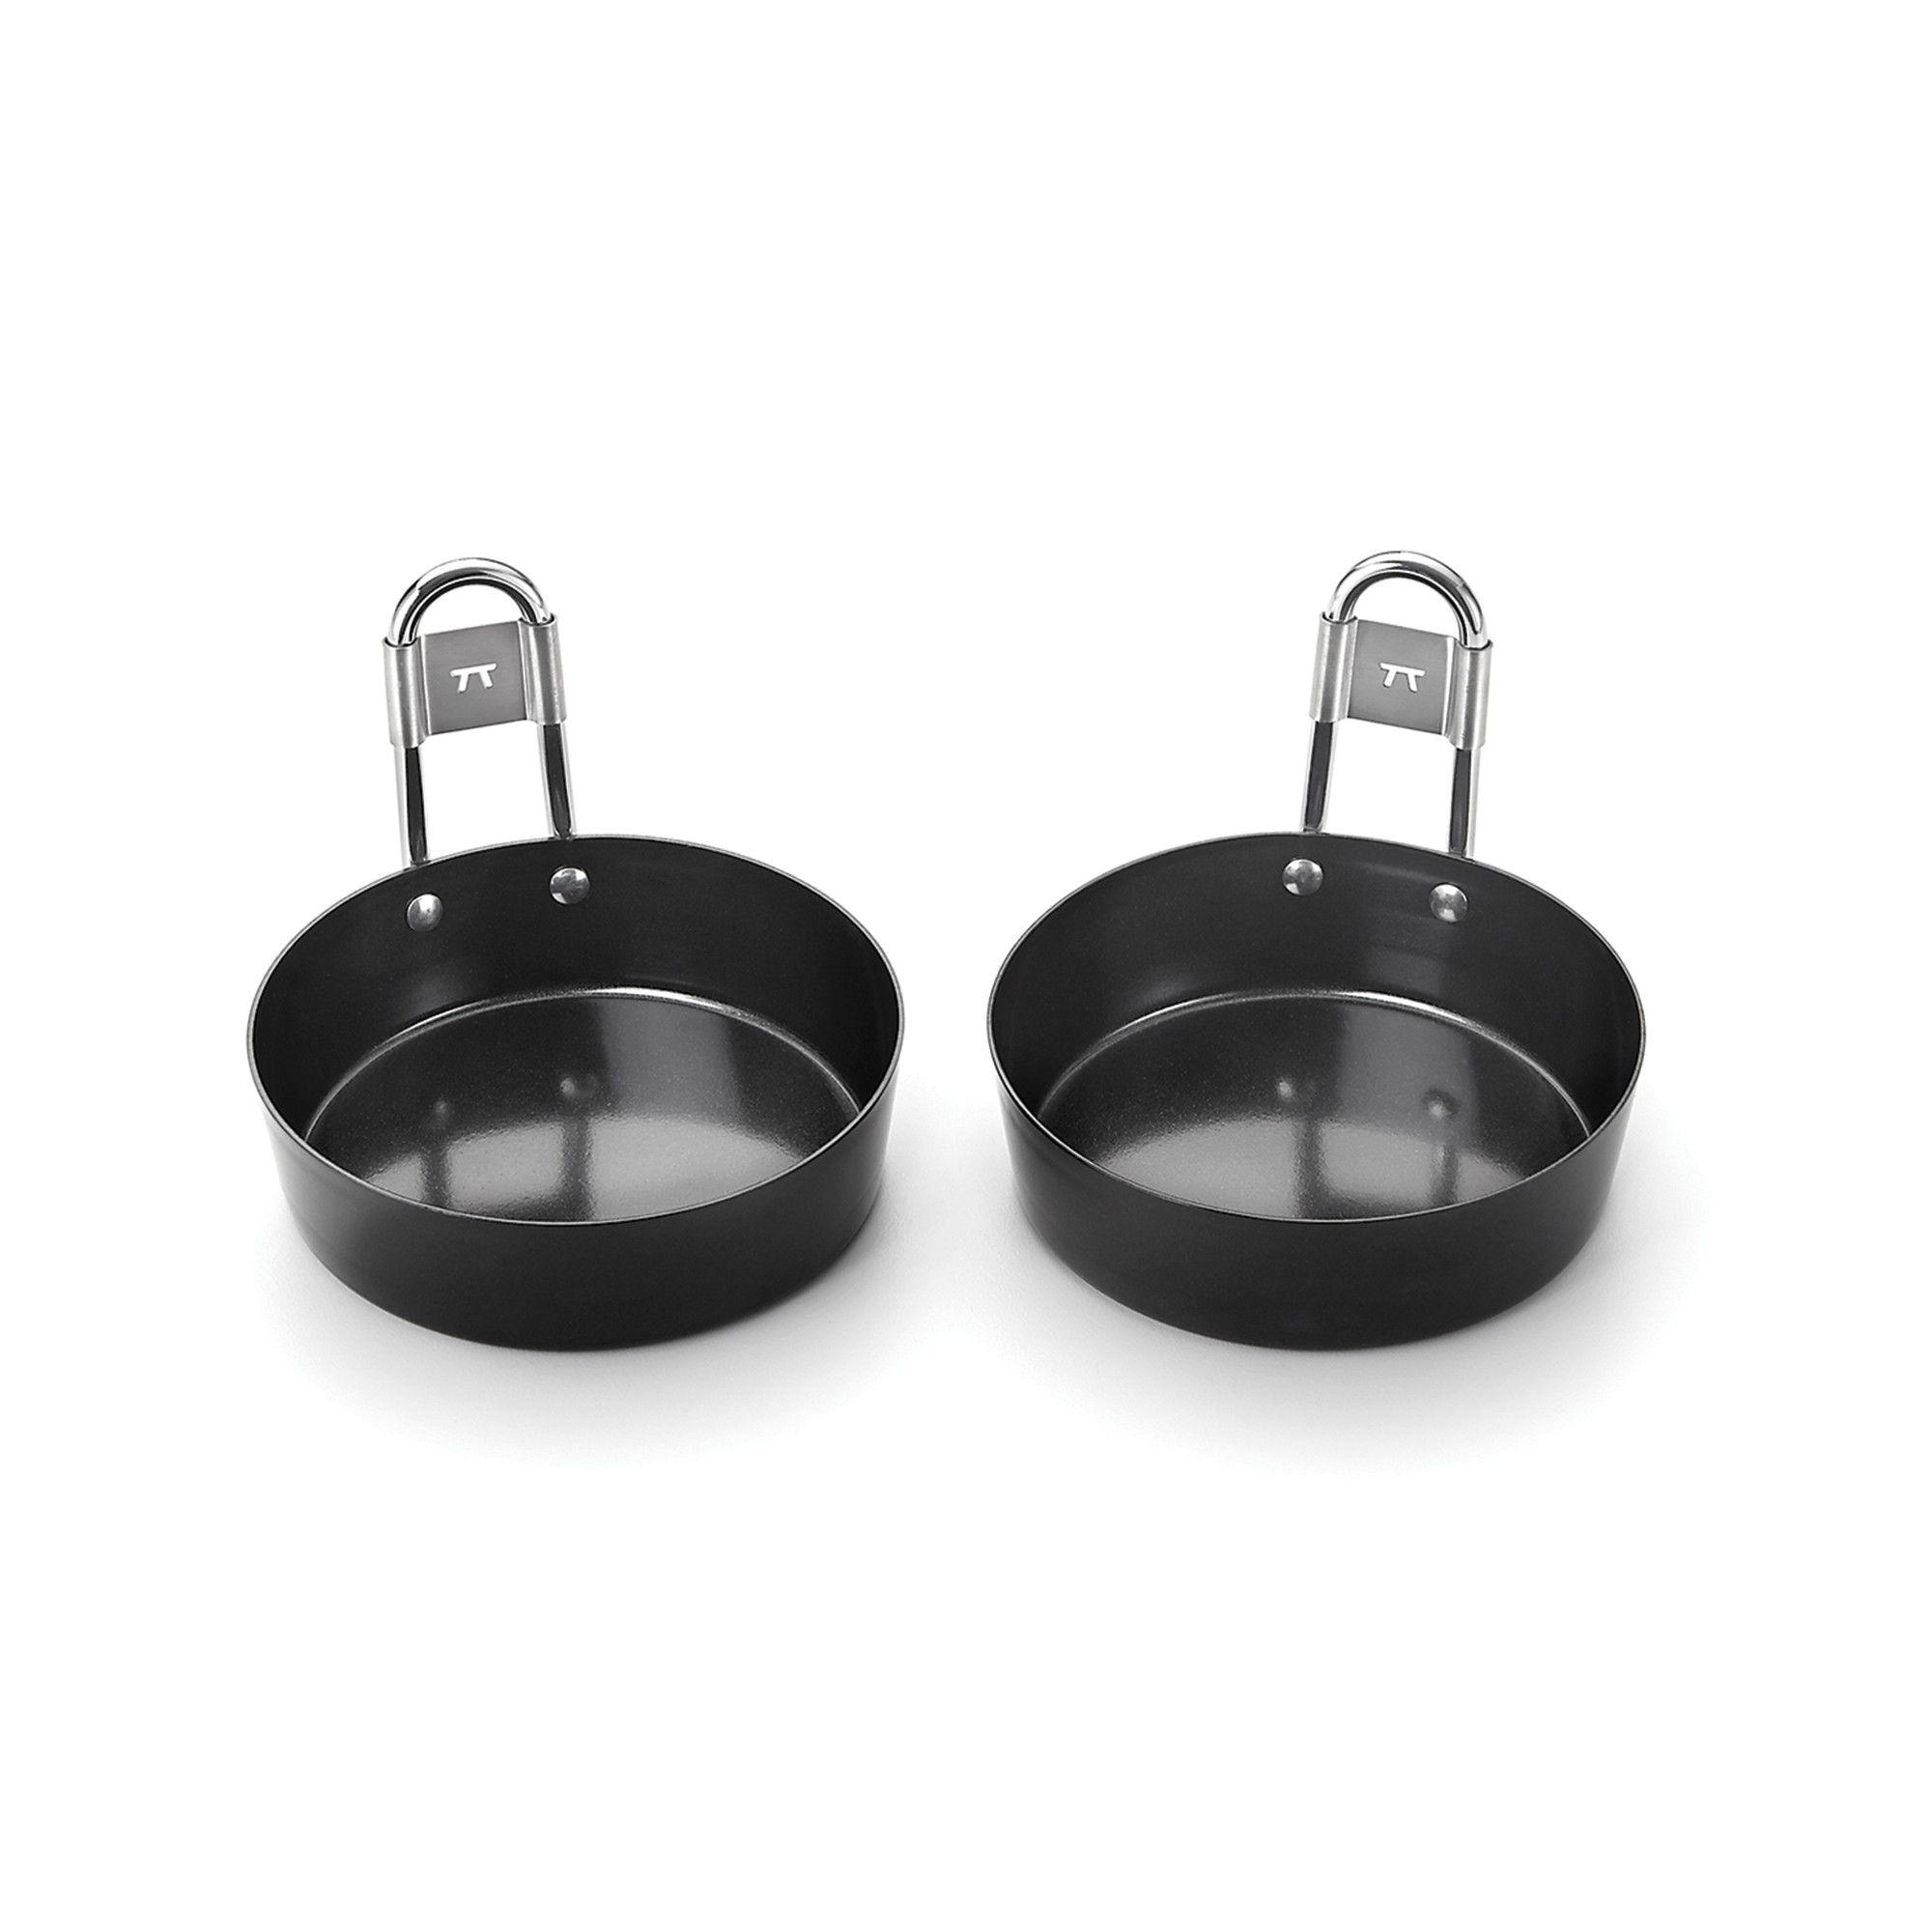 Conjunto De Mini Panelas Antiaderente Para Ovos - Outset